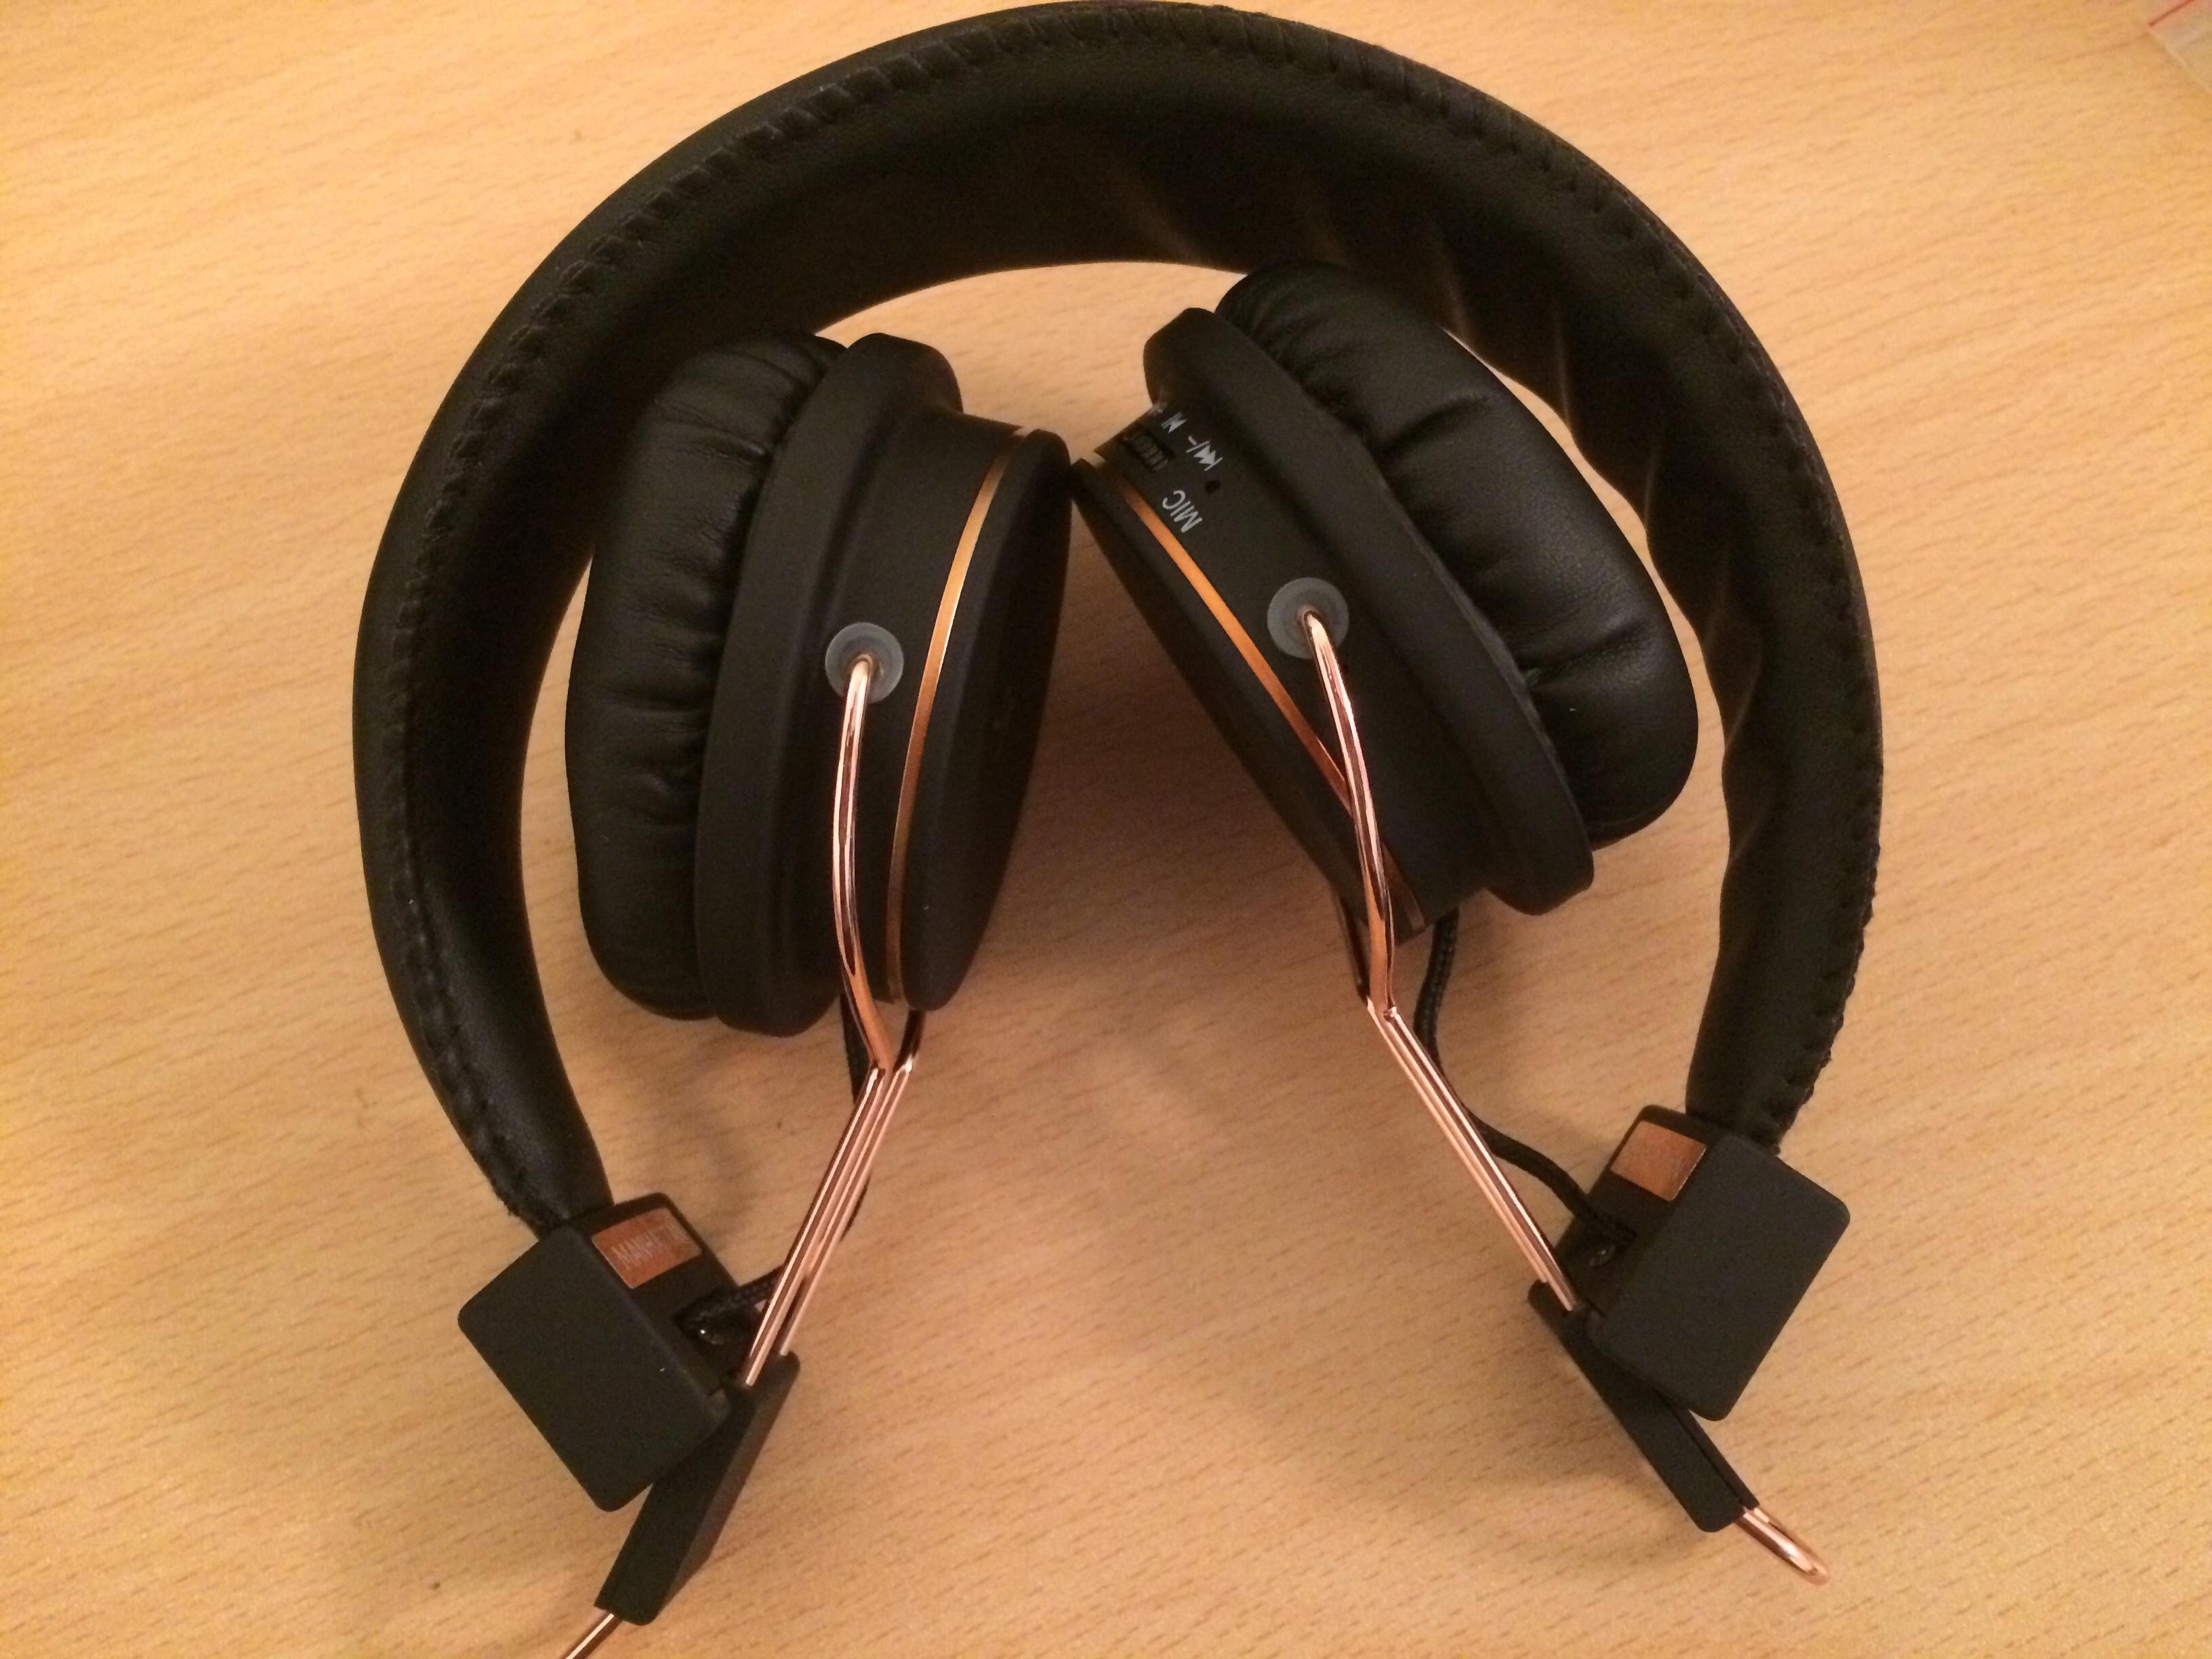 dd3c7839feb KitSound Manhattan Headphones in Rose Gold - A Review - Coolsmartphone